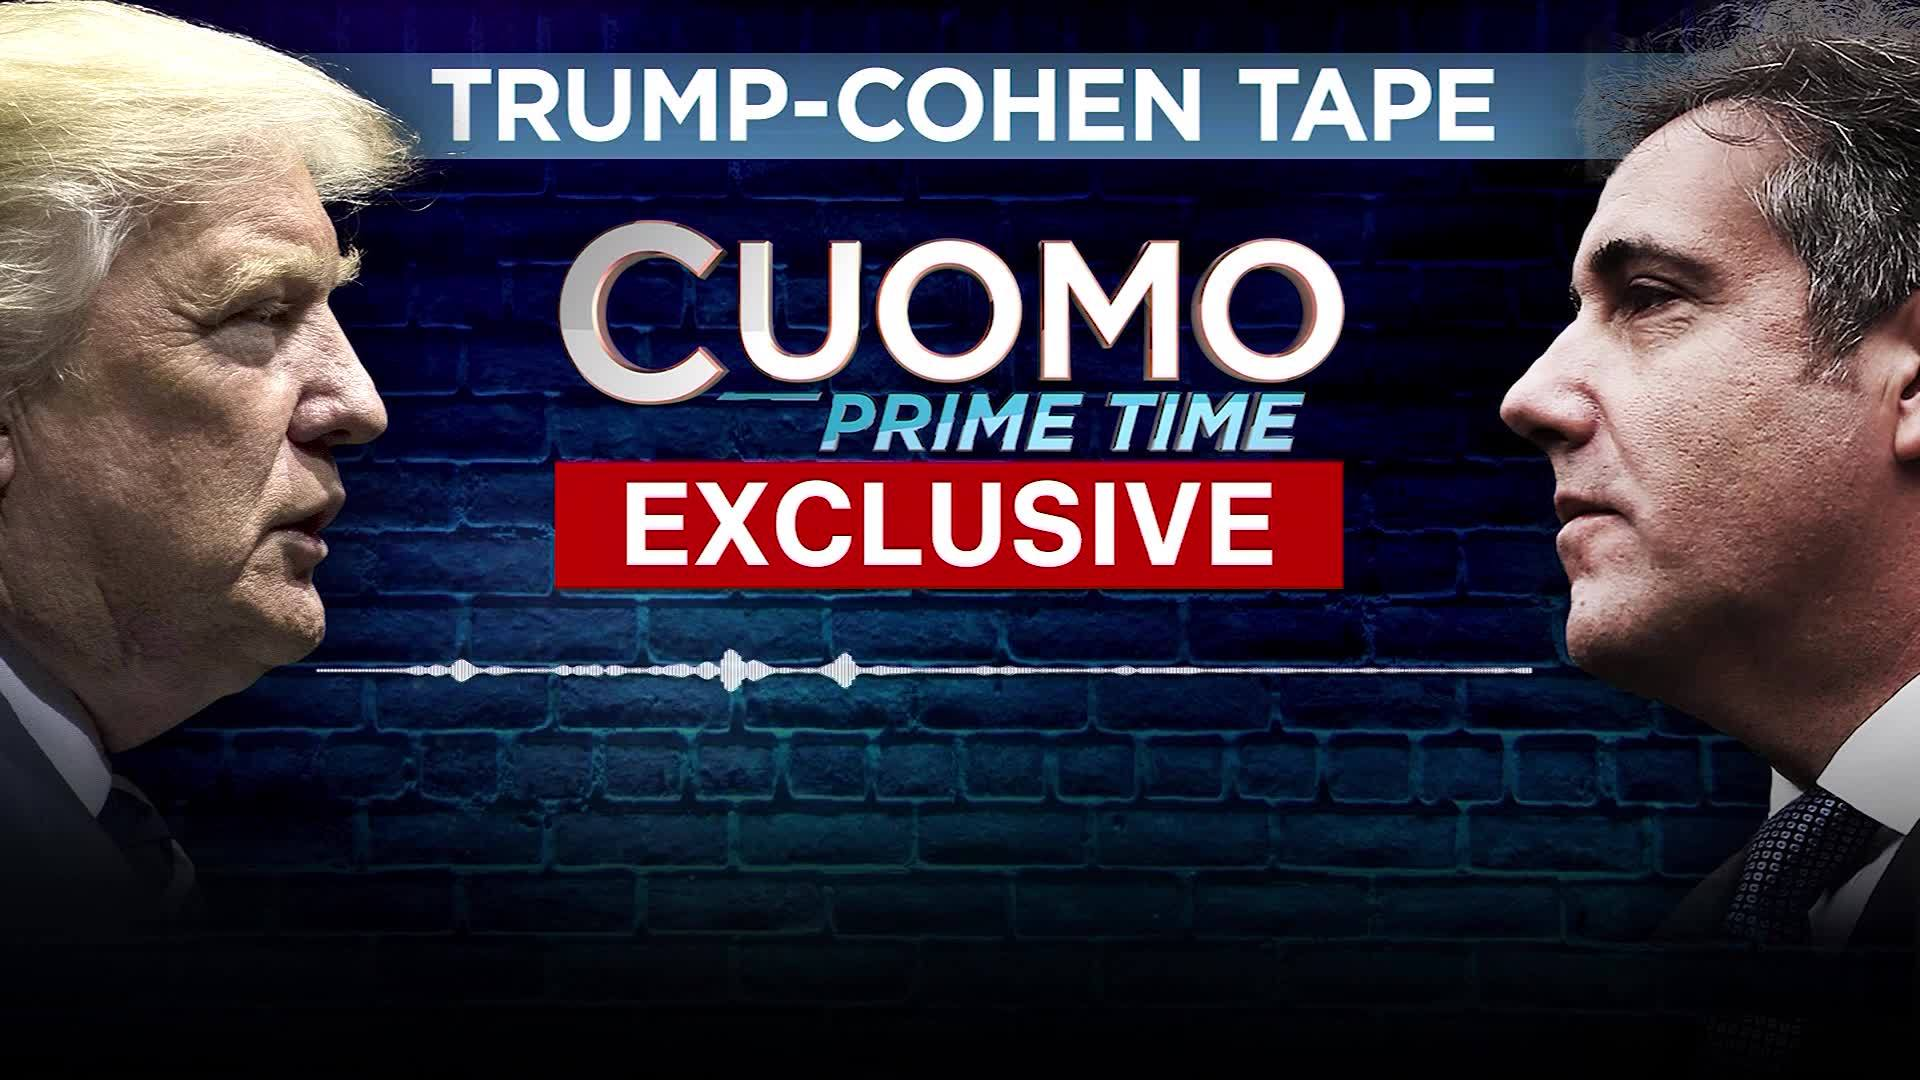 AUDIO FILE: CNN obtains Trump-Cohen audio recording